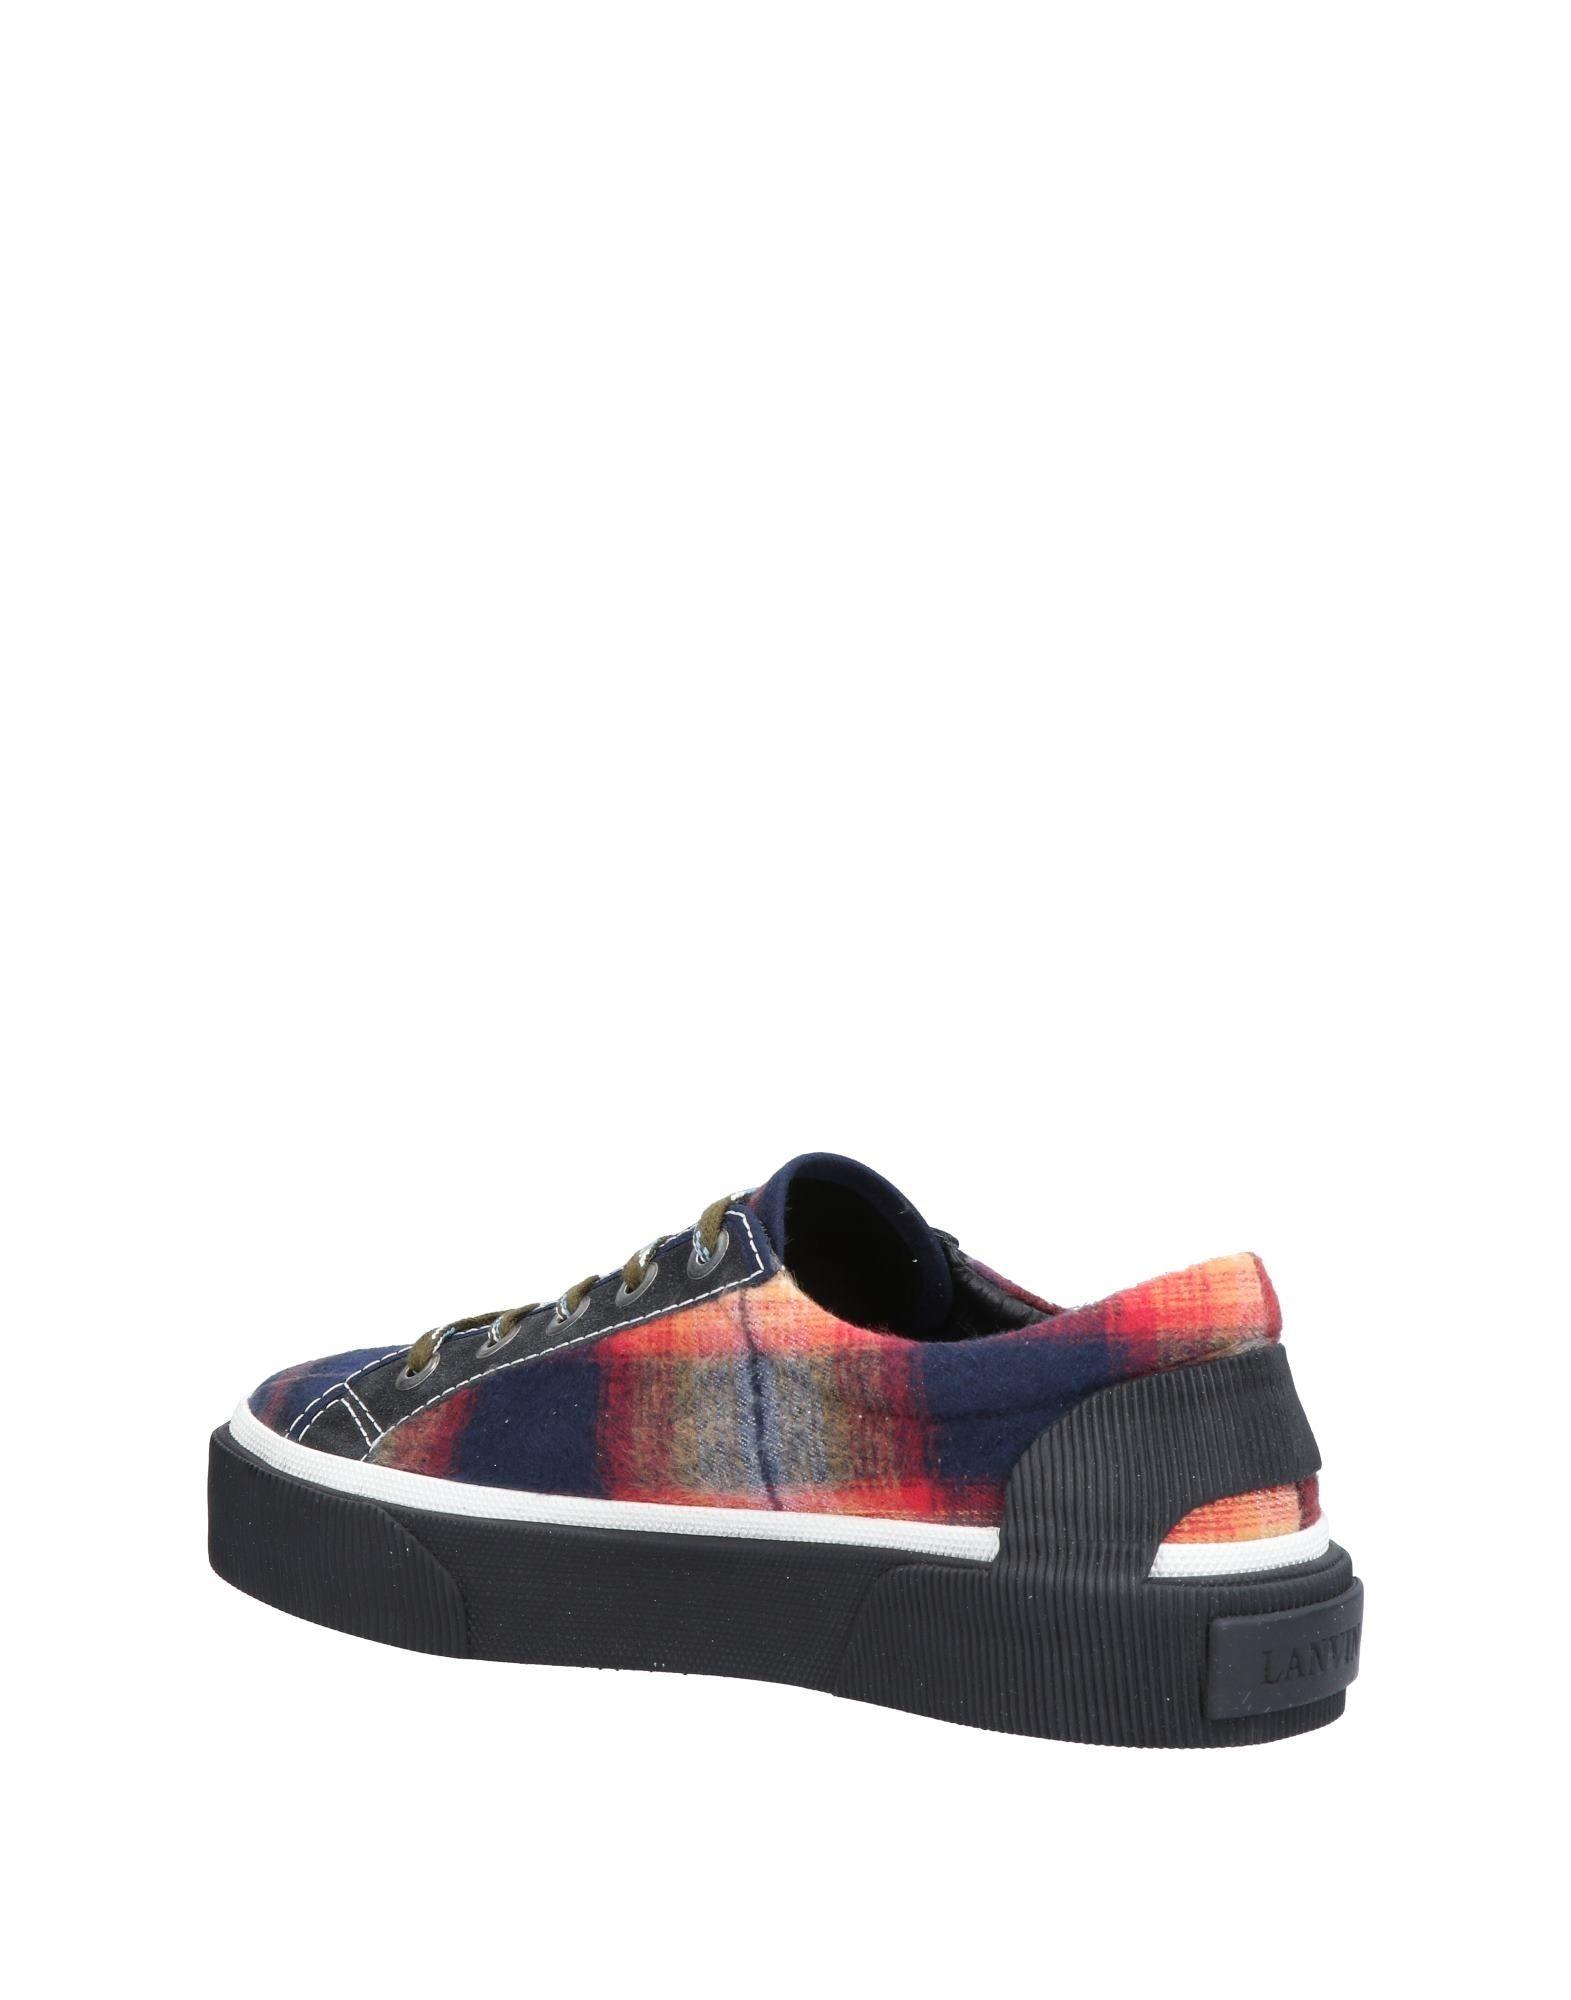 Lanvin Sneakers Herren  11486040VR Gute Qualität beliebte Schuhe